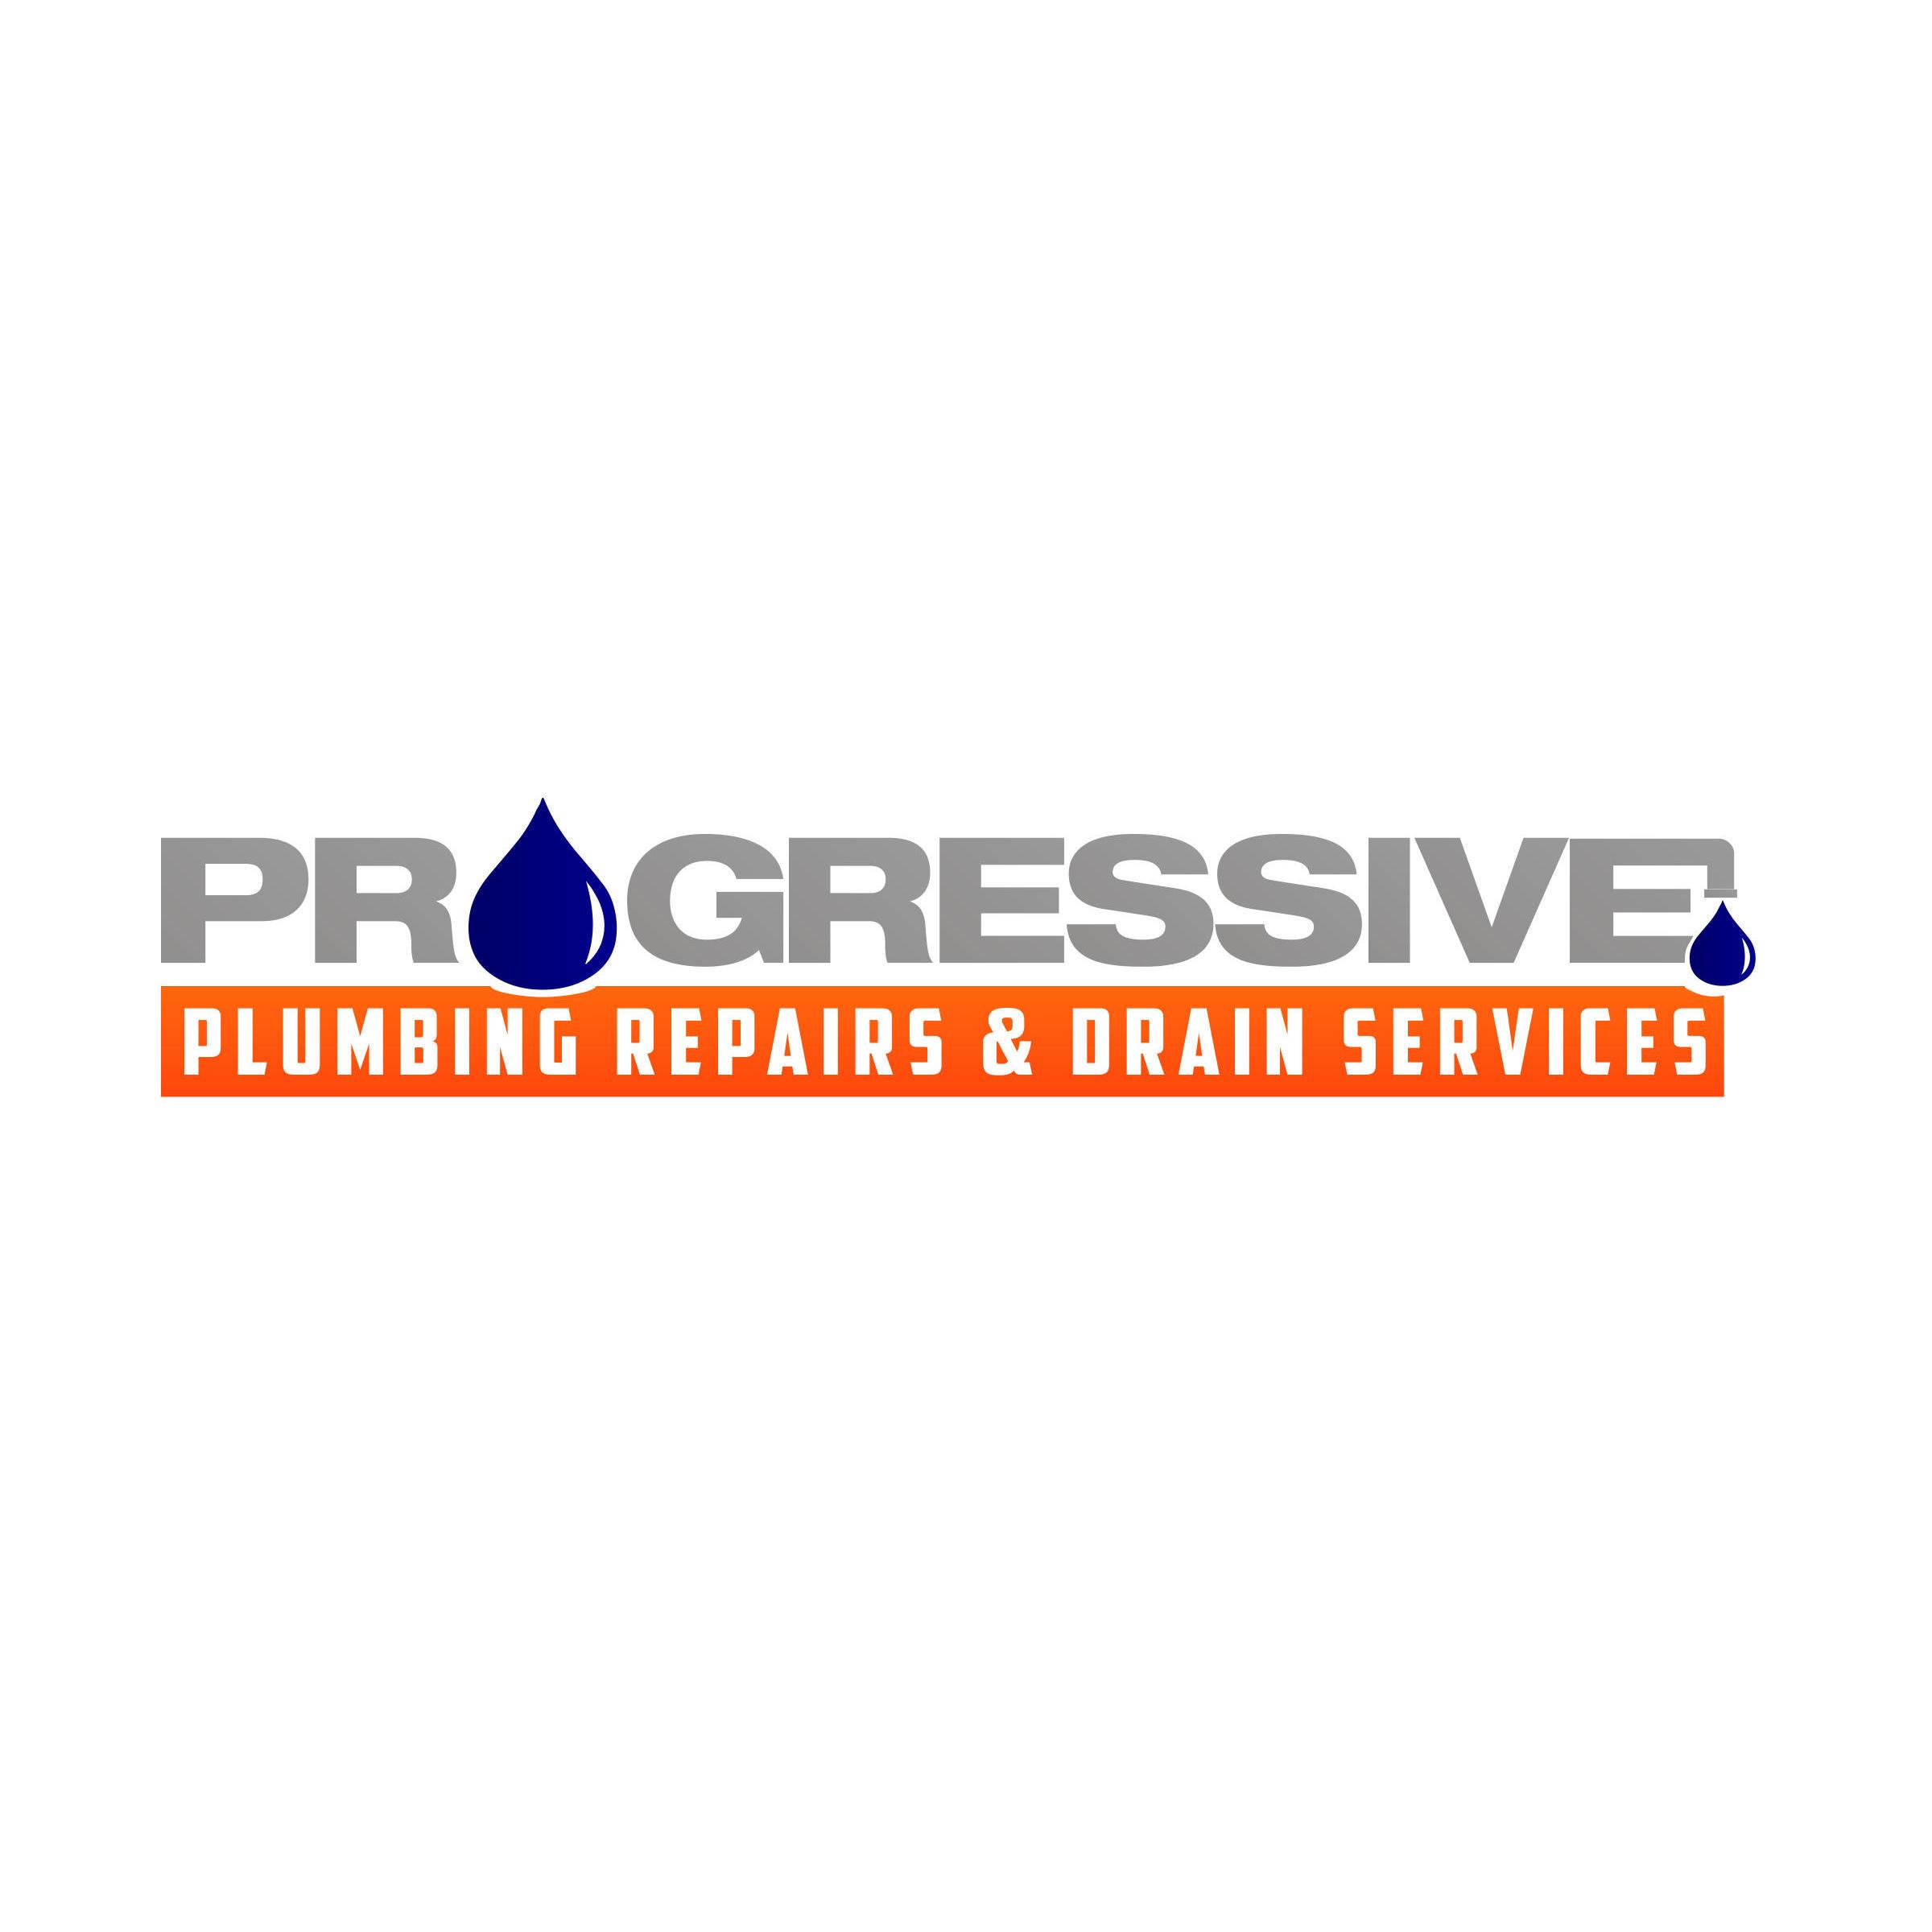 Progressive Plumbing Repairs & Drain Services